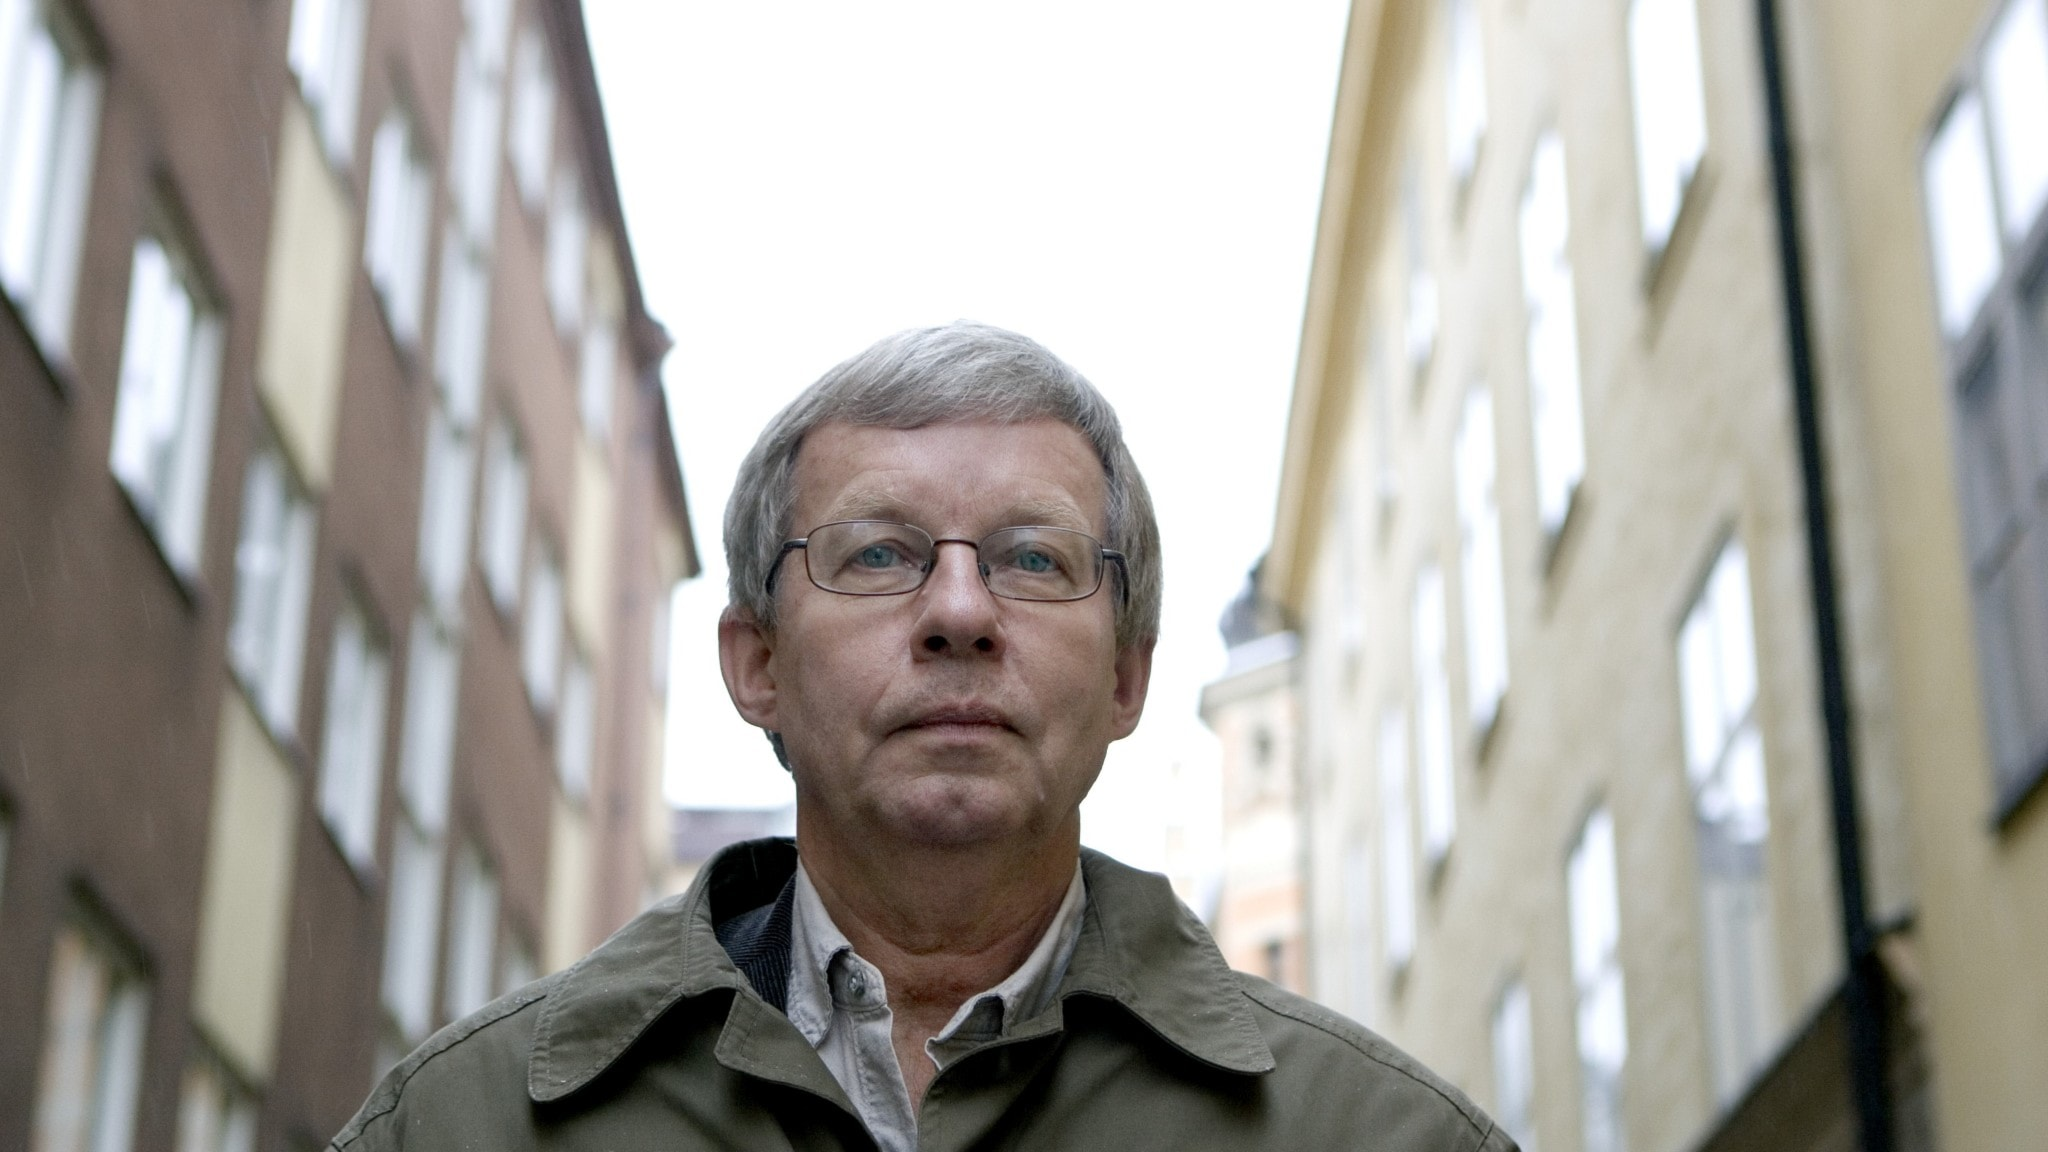 Torbjörn Tännsjö,